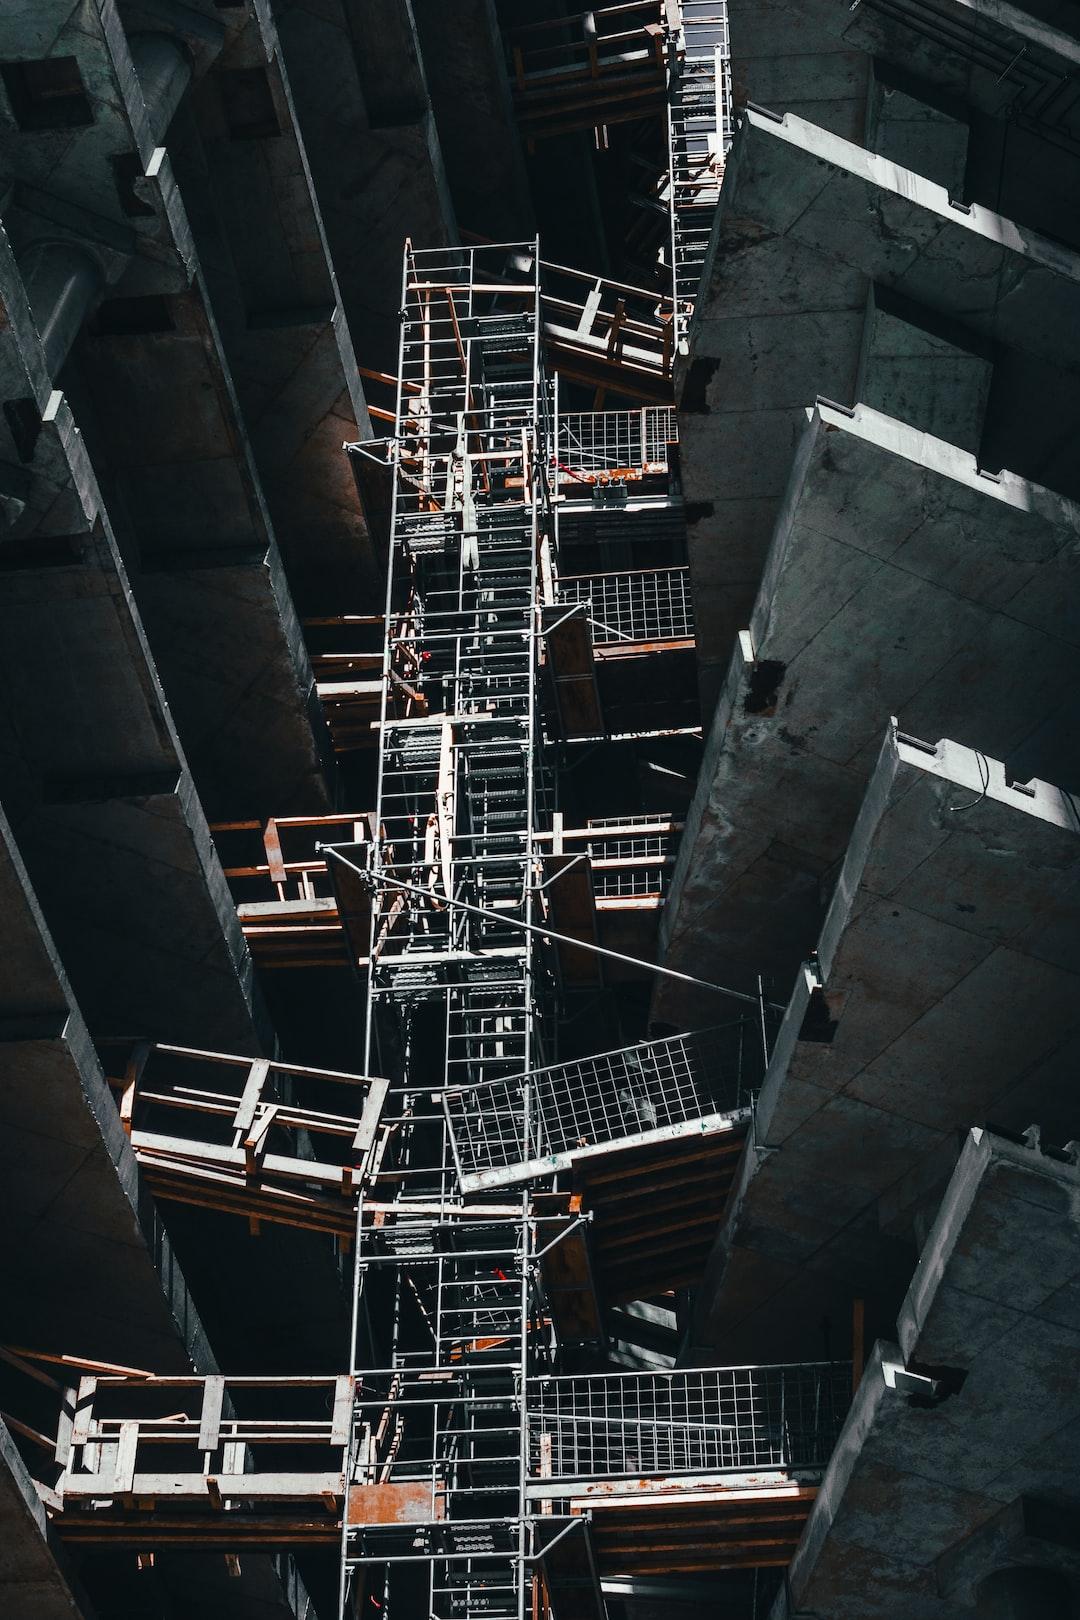 Structure under construction